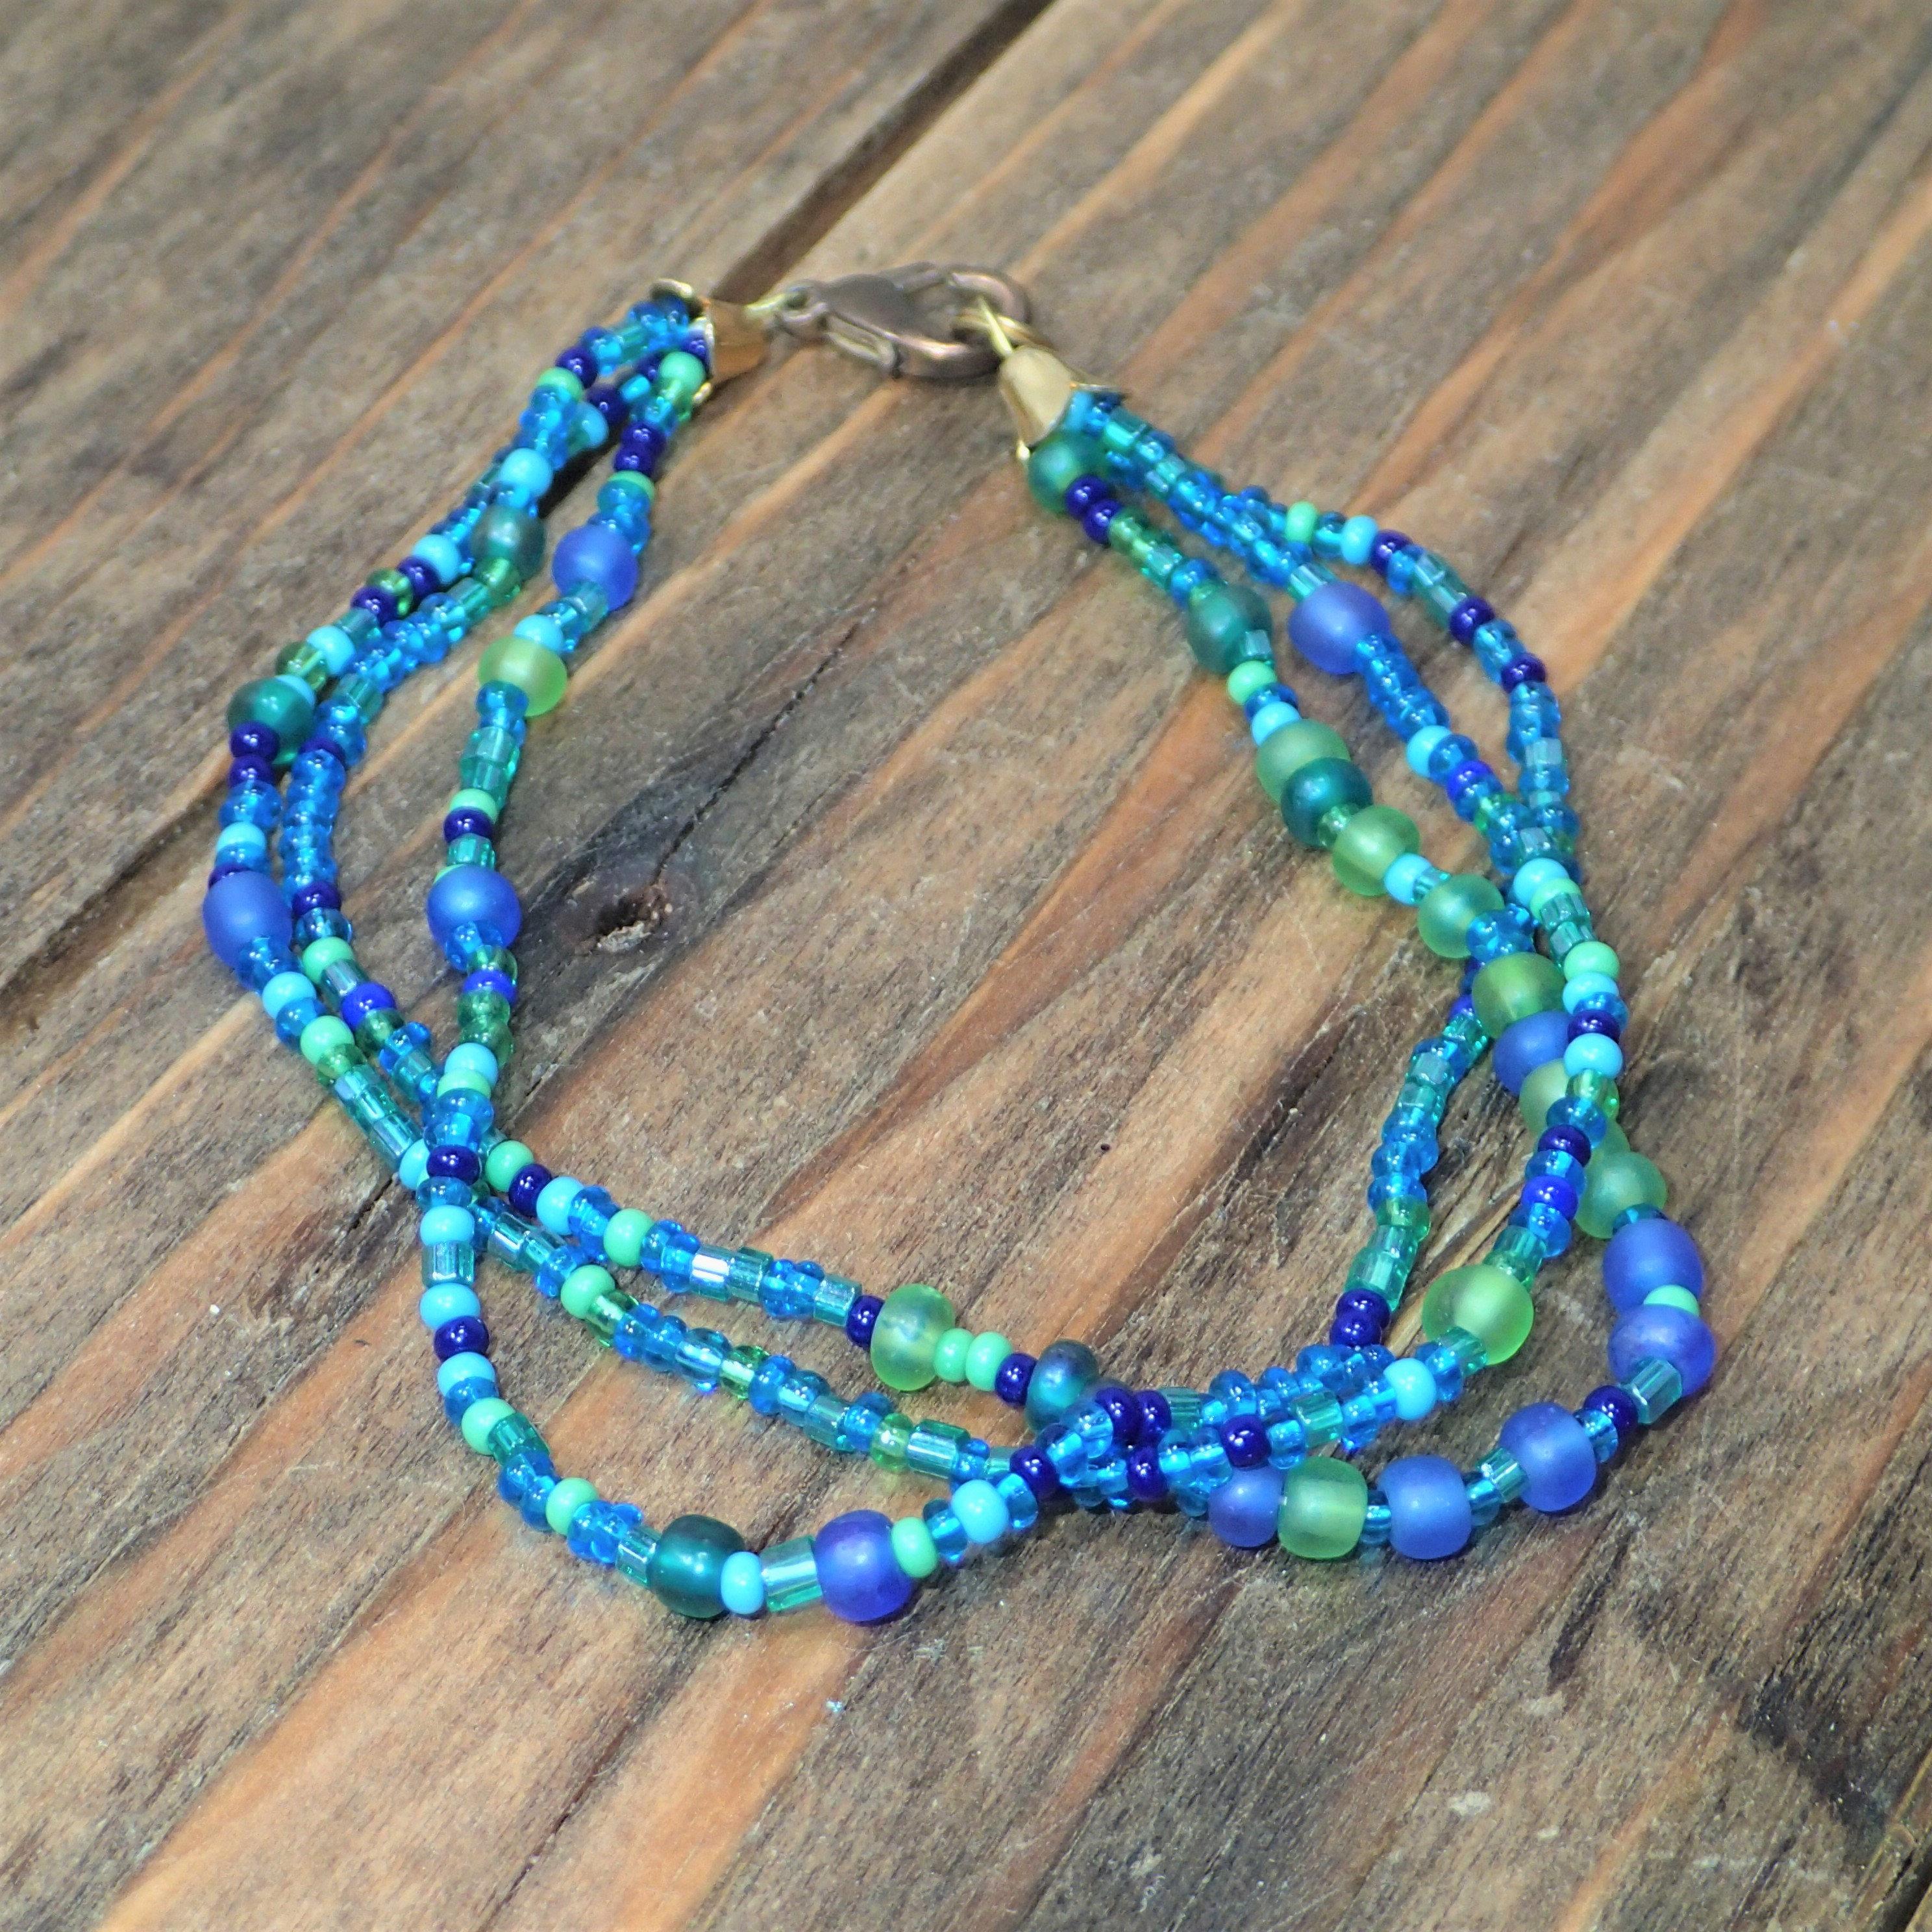 Vintage Beach Bracelet Bracelets for Women Glass Bead   Etsy